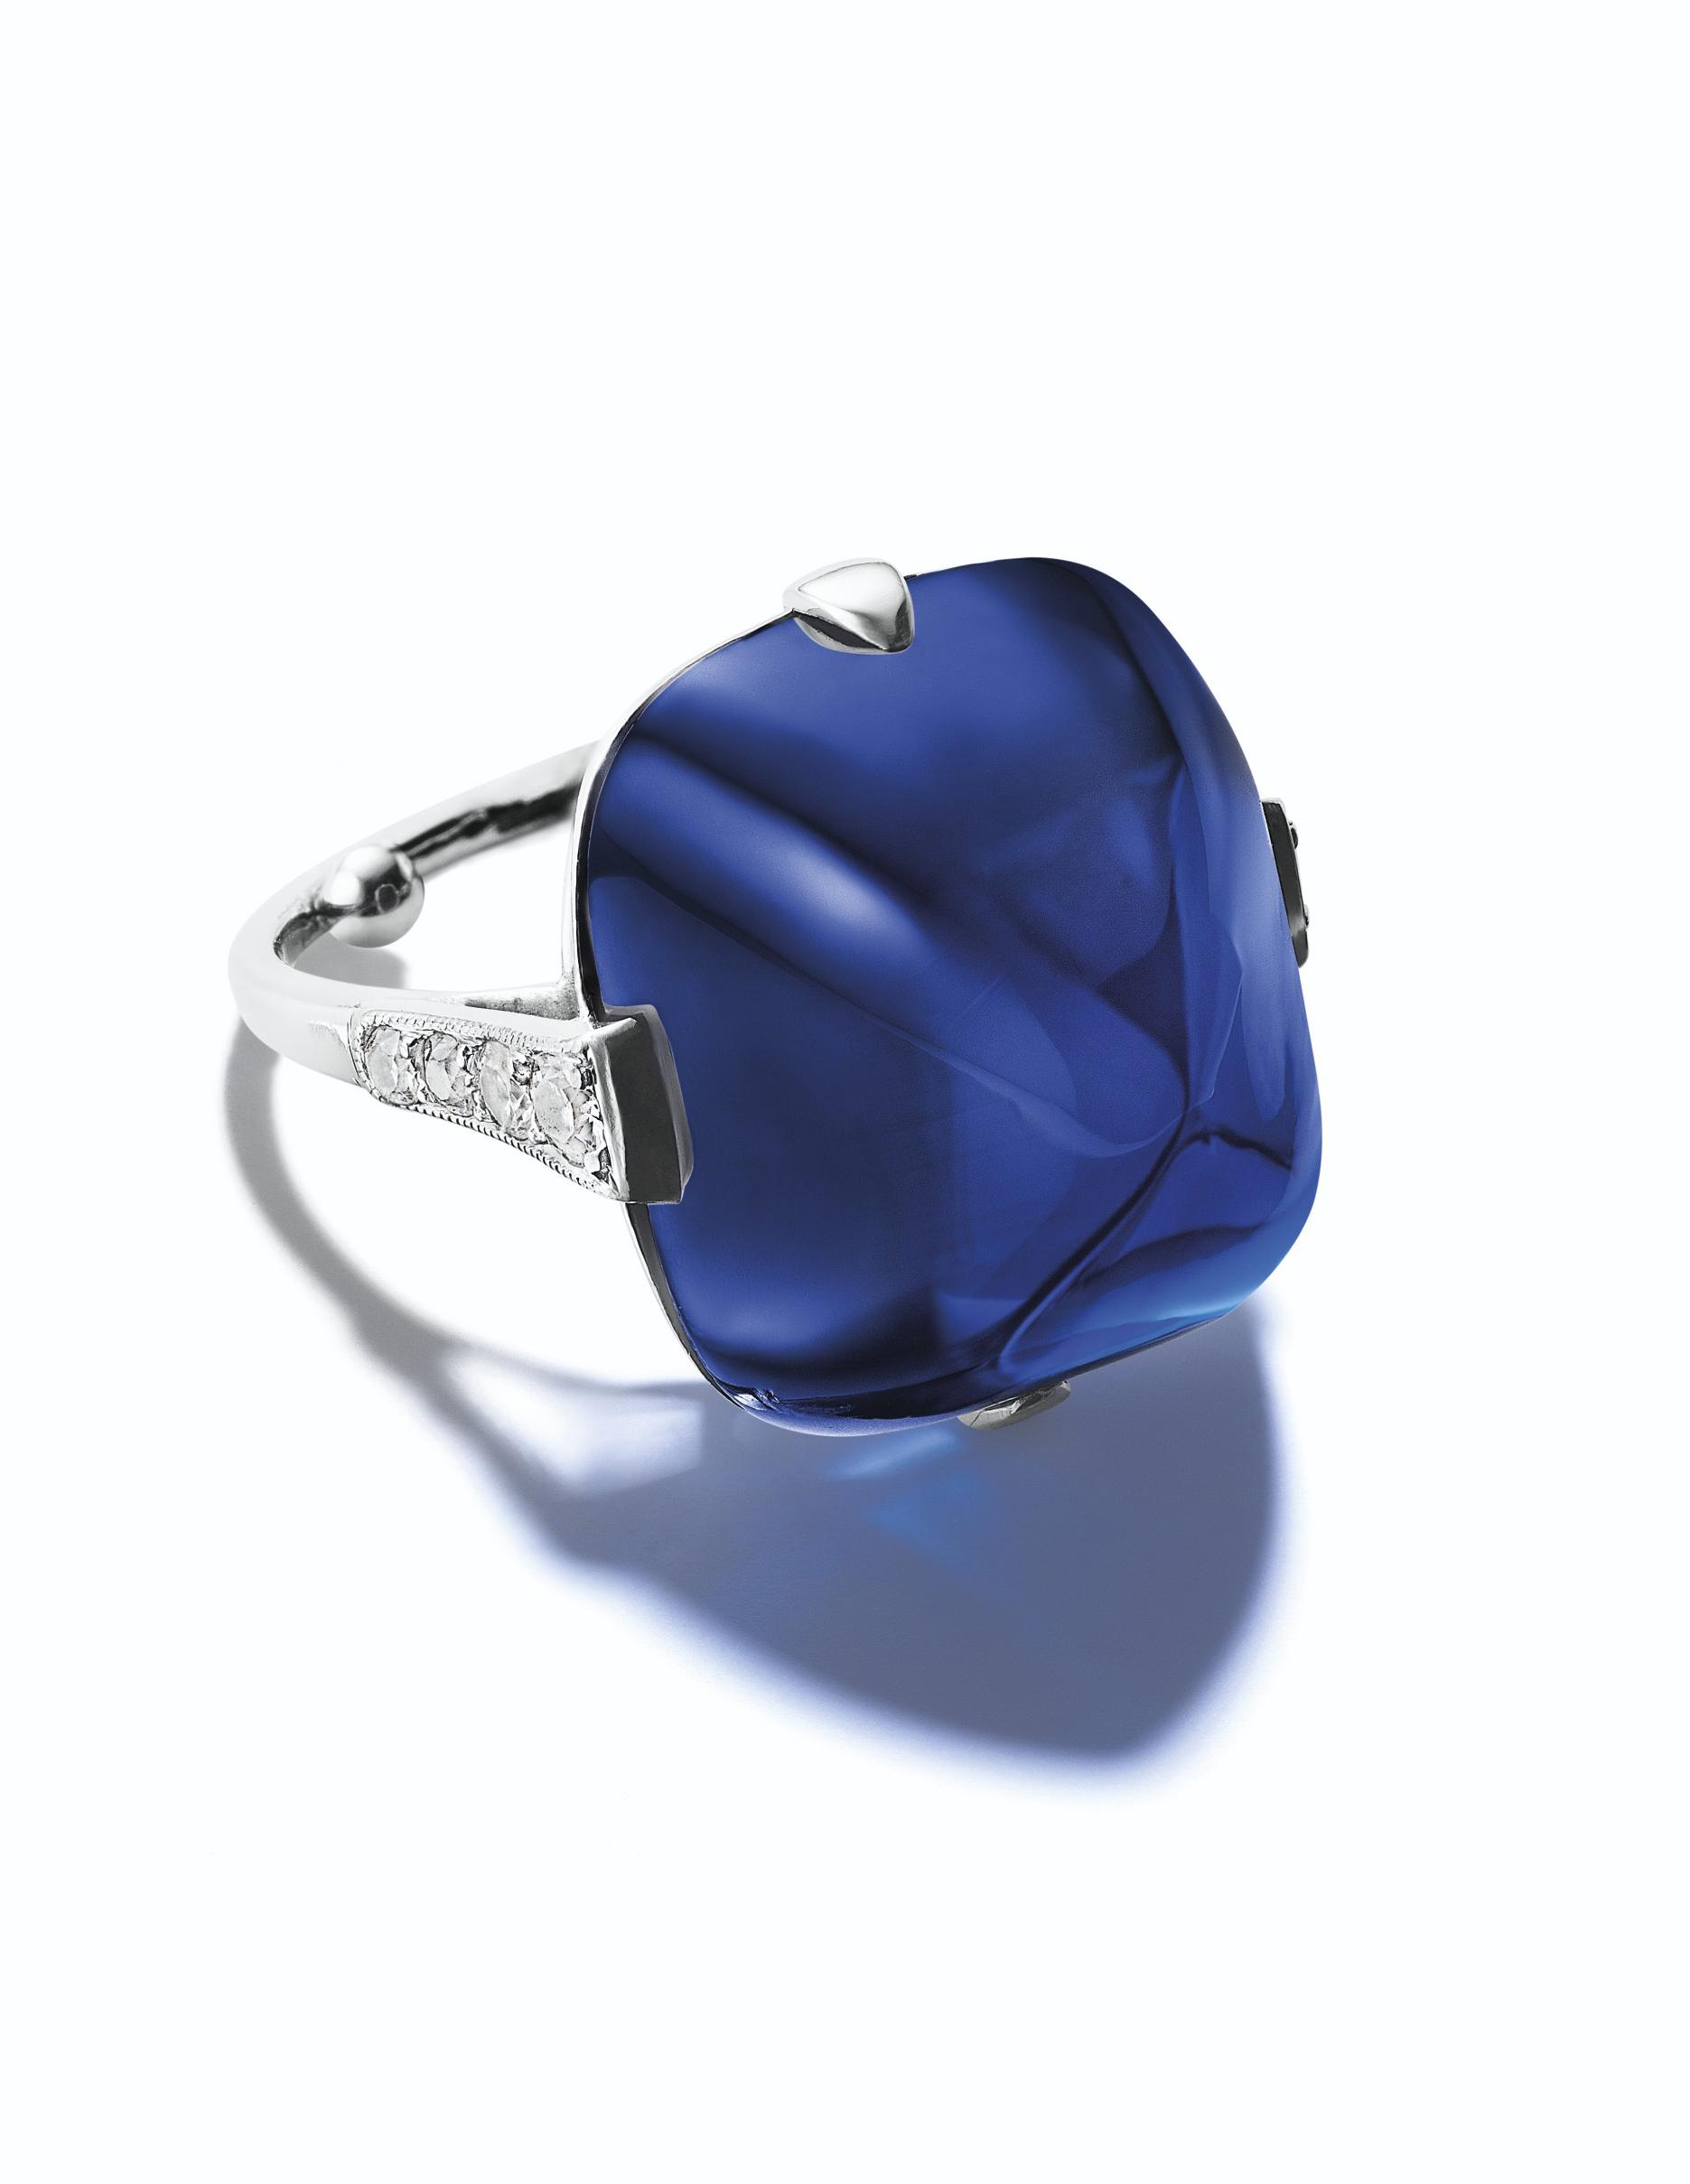 A SUPERB BELLE ÉPOQUE SAPPHIRE AND DIAMOND RING